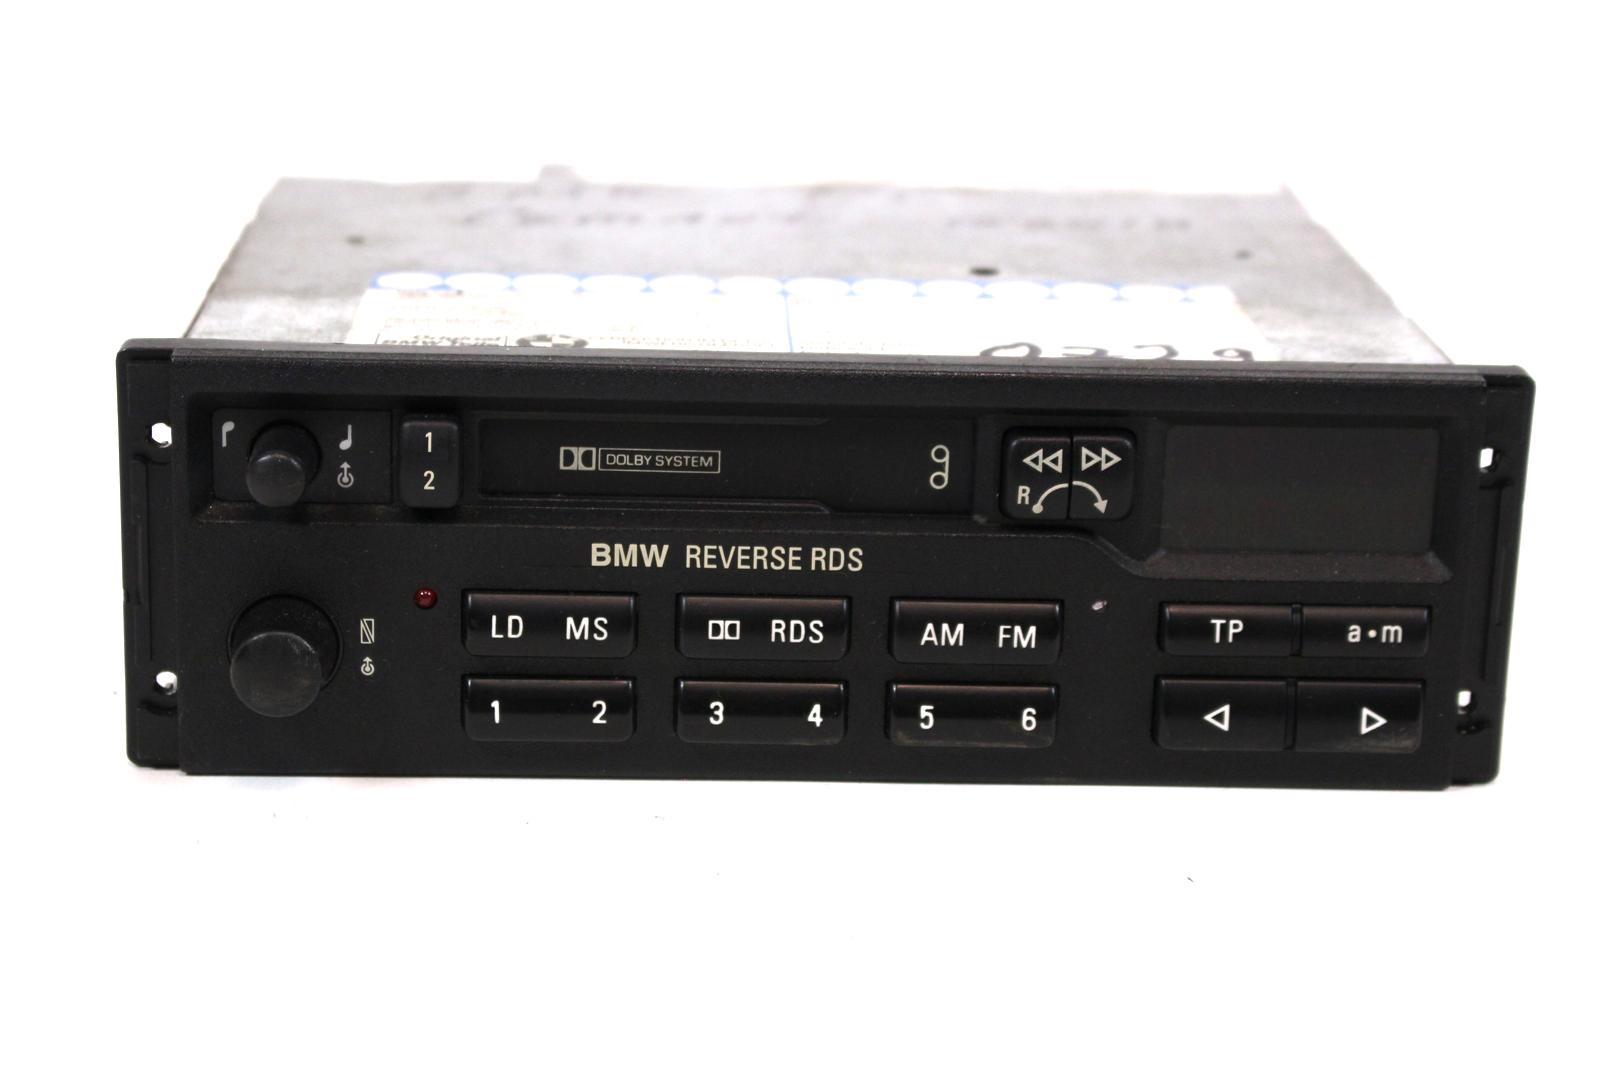 autoradio blaupunkt mc kassette bmw reverse rds 7643835340. Black Bedroom Furniture Sets. Home Design Ideas